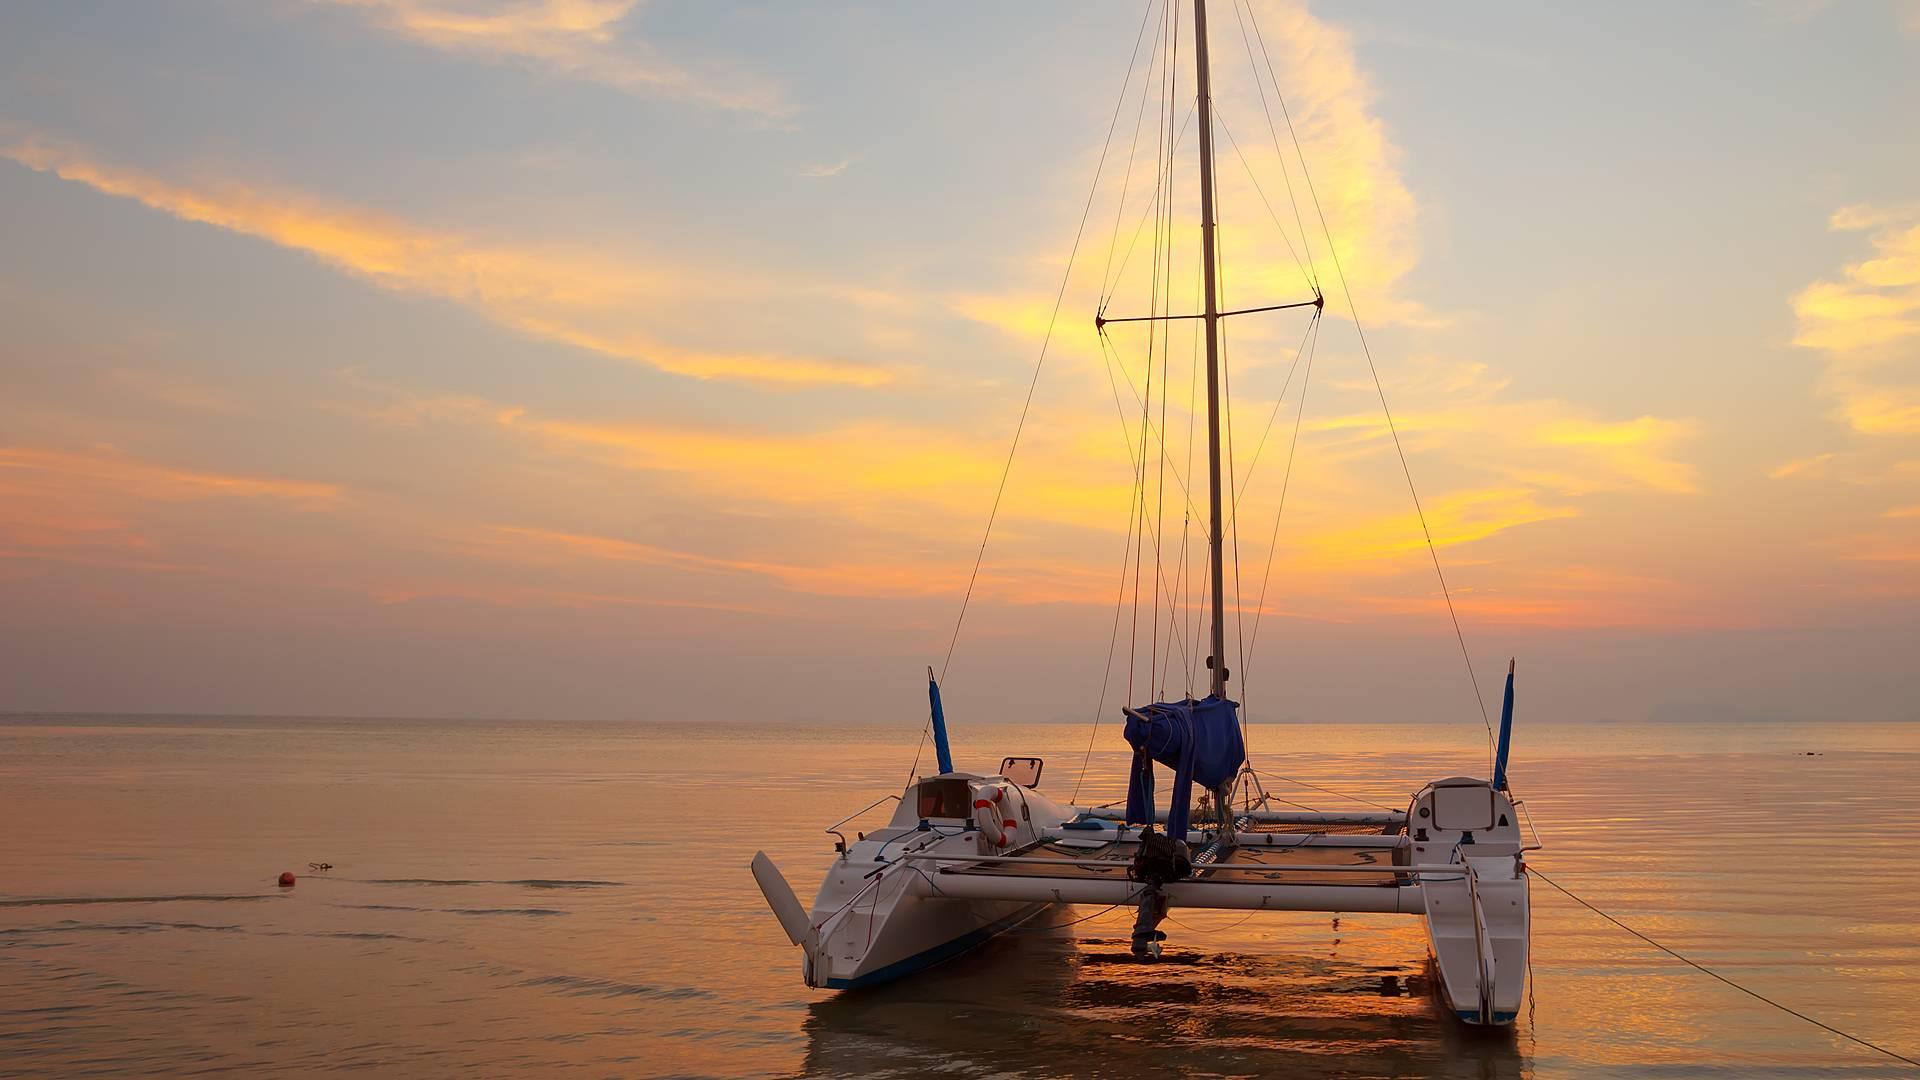 Voyage de noce: Idylle en mer entre Phuket et Khao Sok